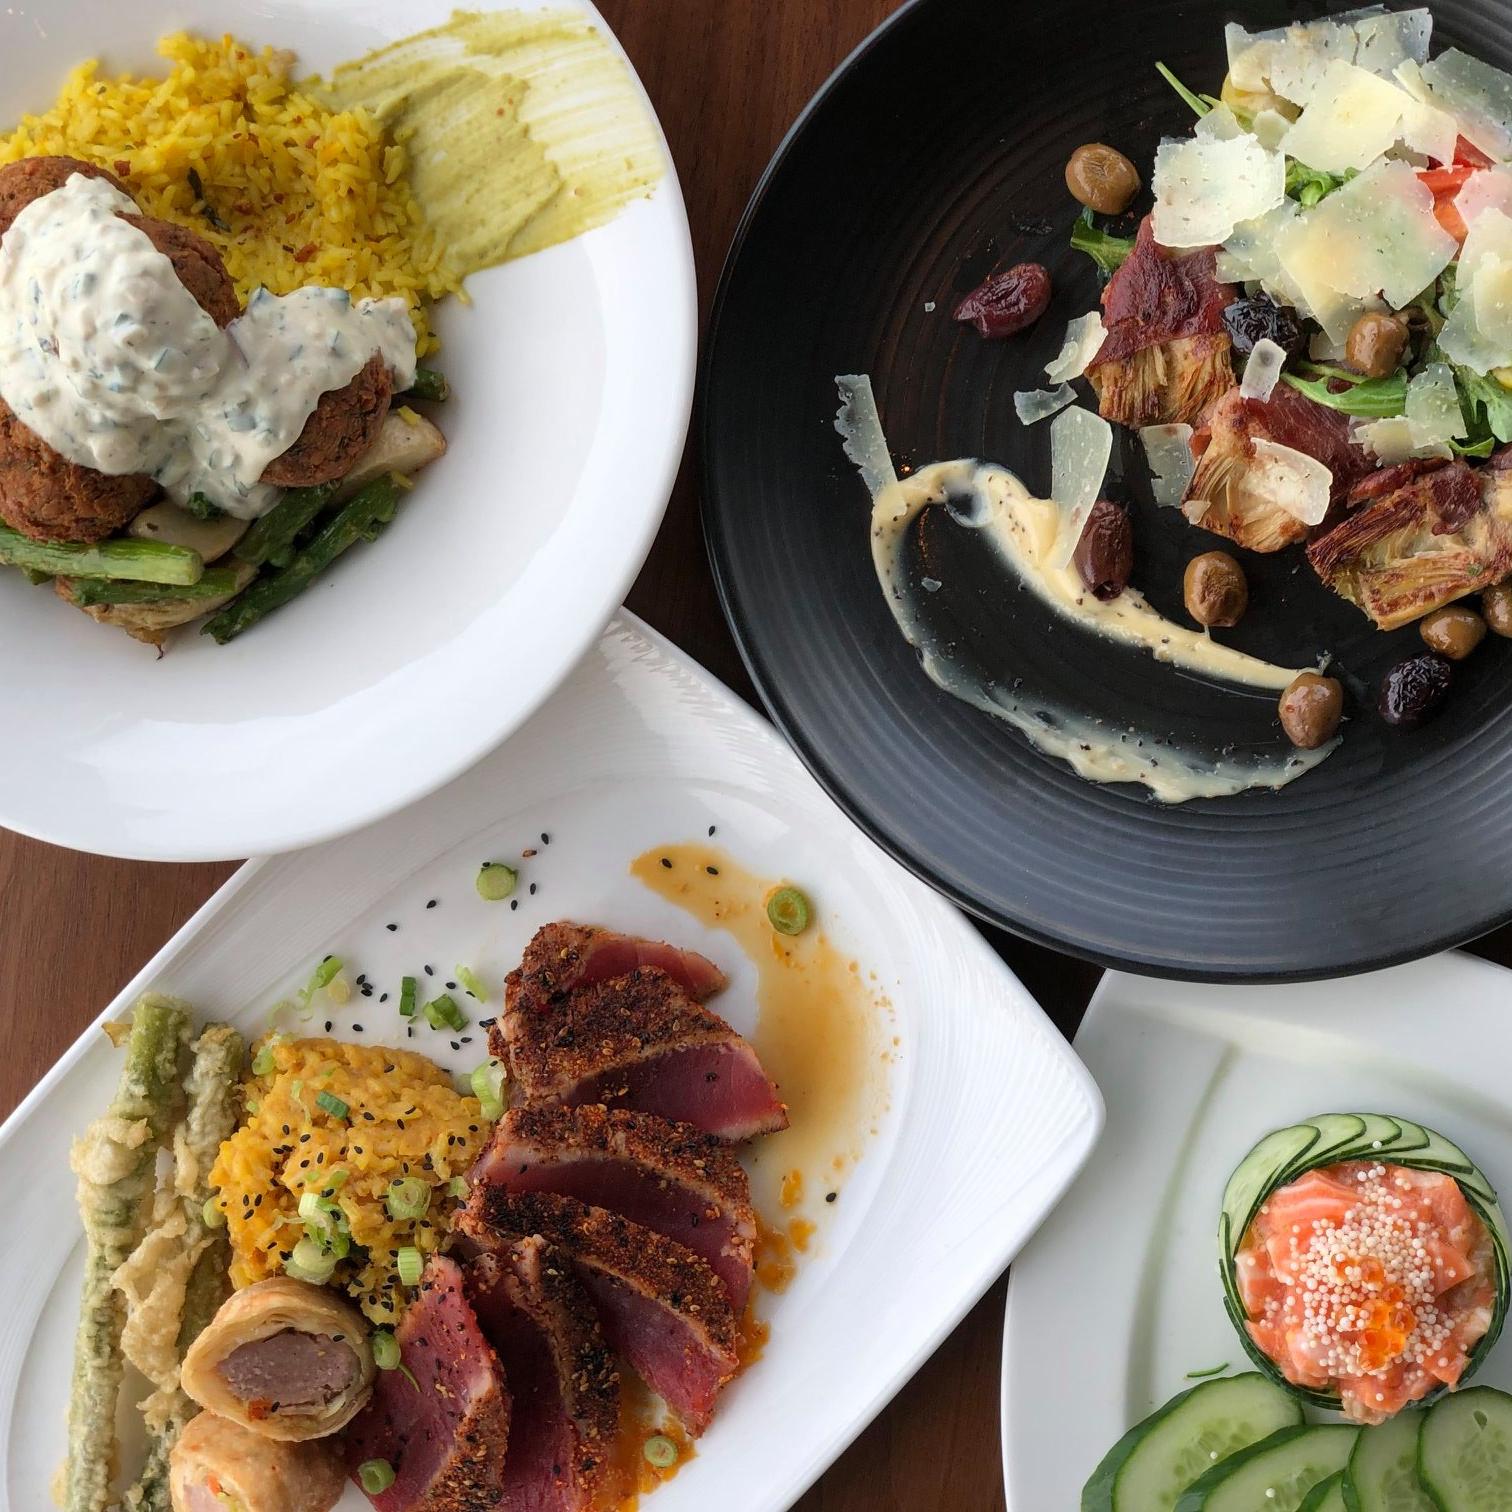 The Top 14 Restaurants in Pittsburgh